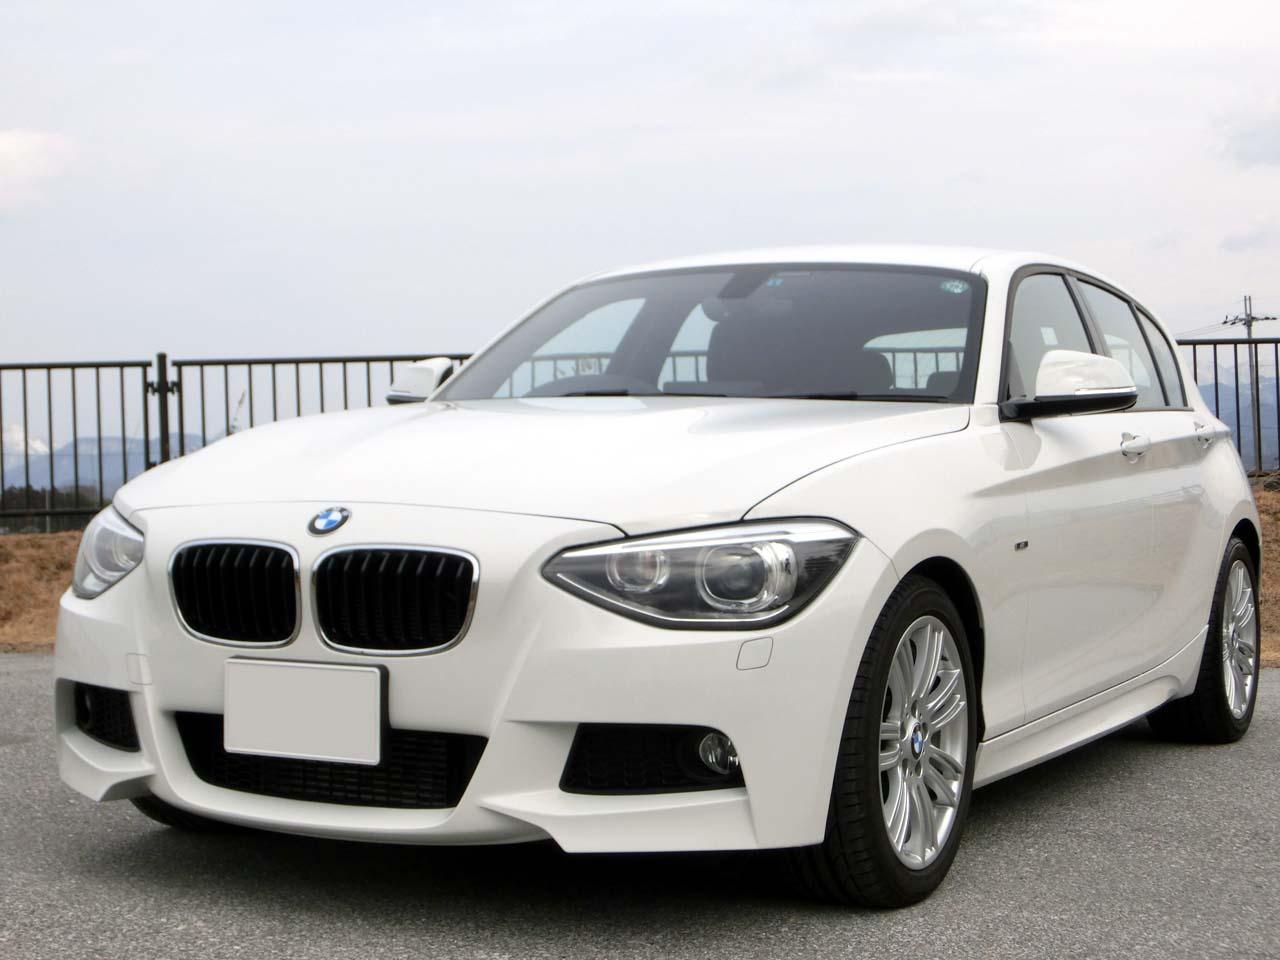 BMW・1シリーズの画像 p1_39